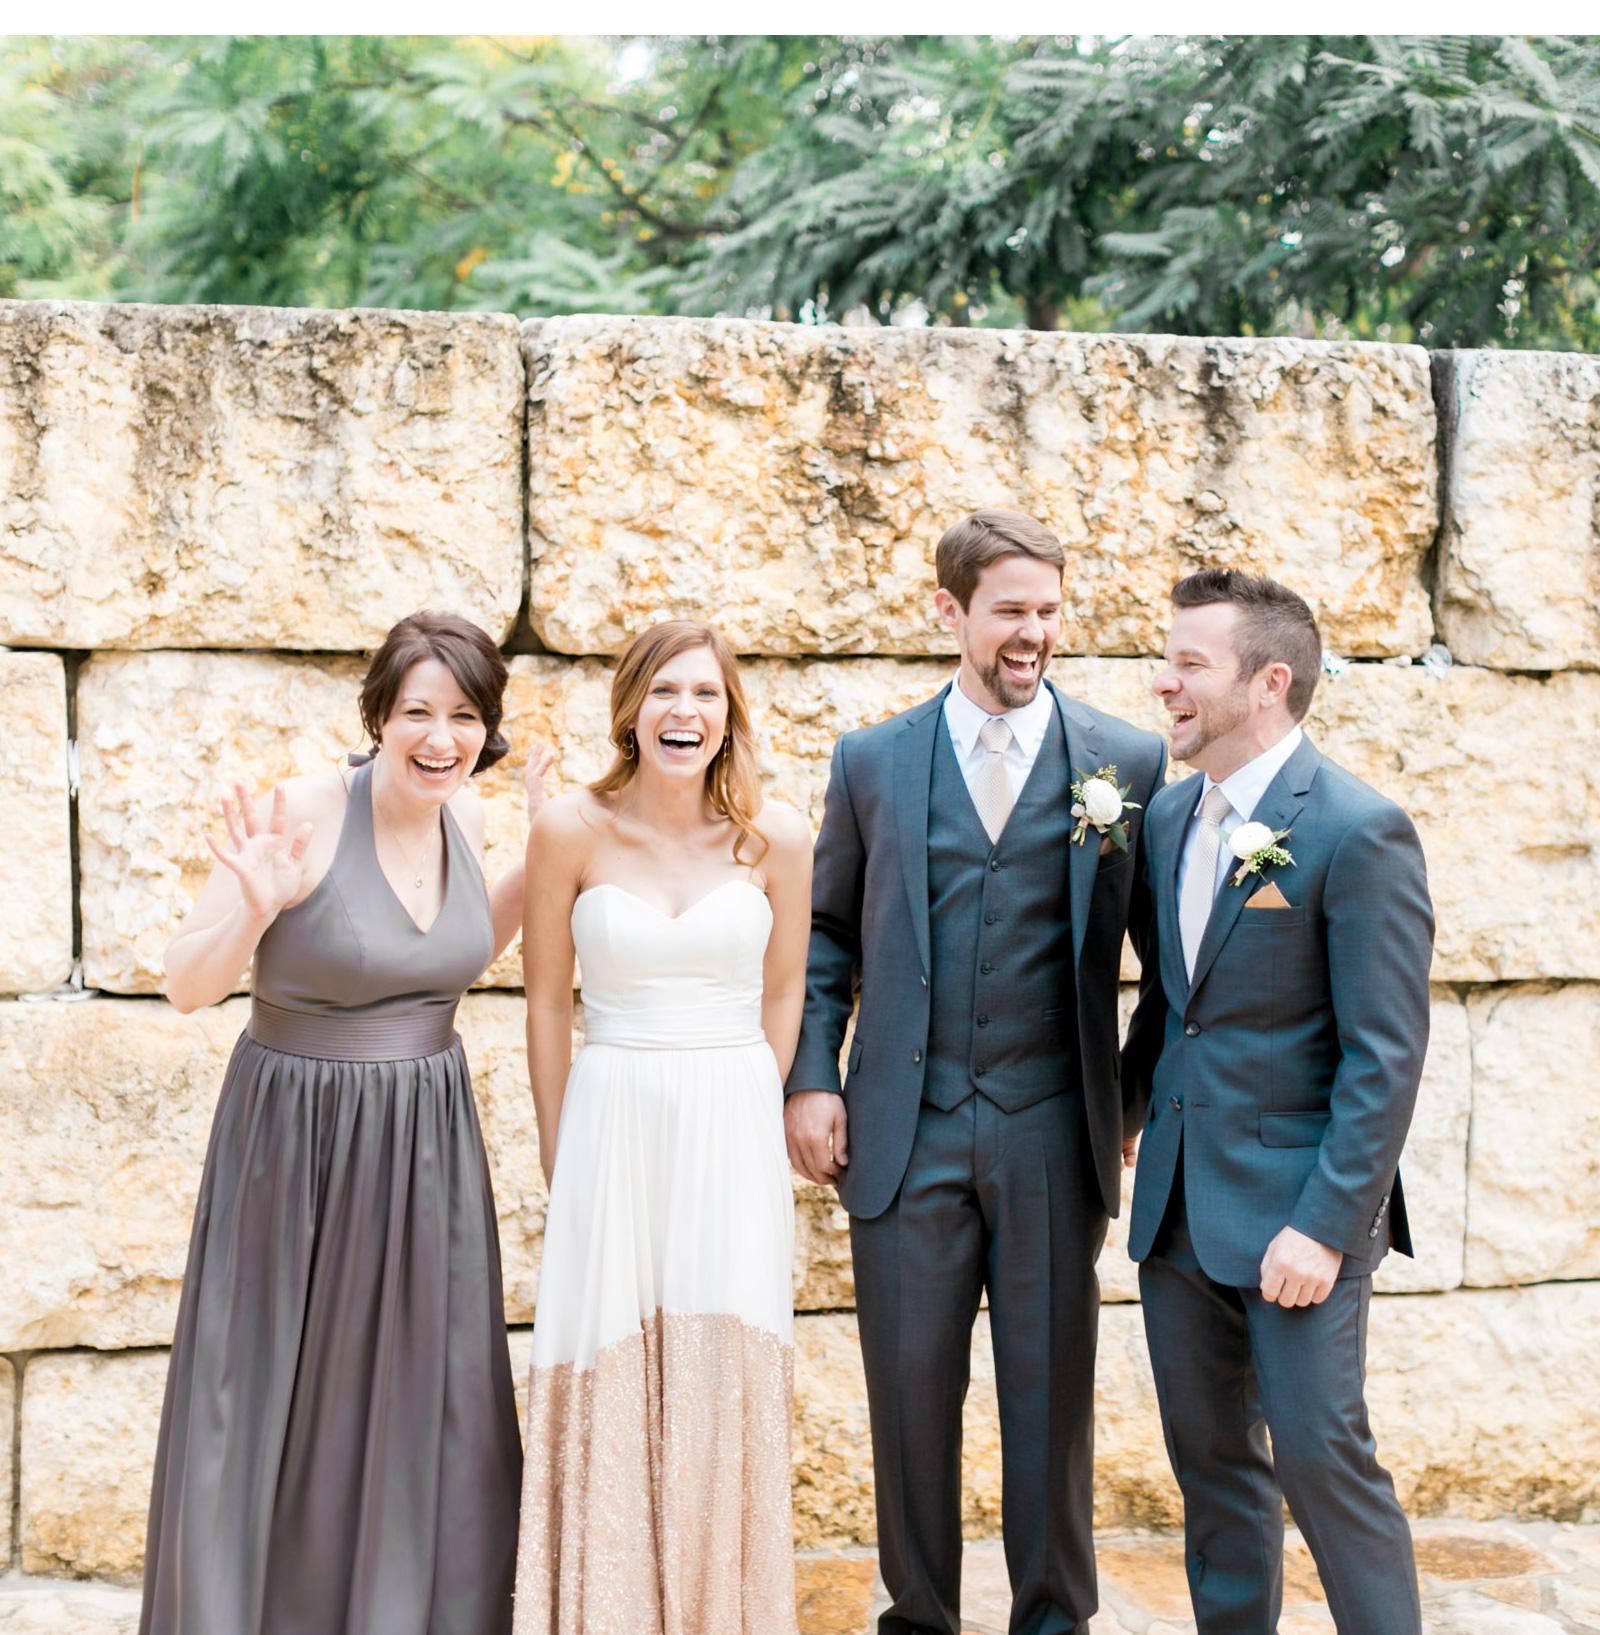 Orange-County-Wedding-Photography-Natalie-Schutt-Photography_04.jpg